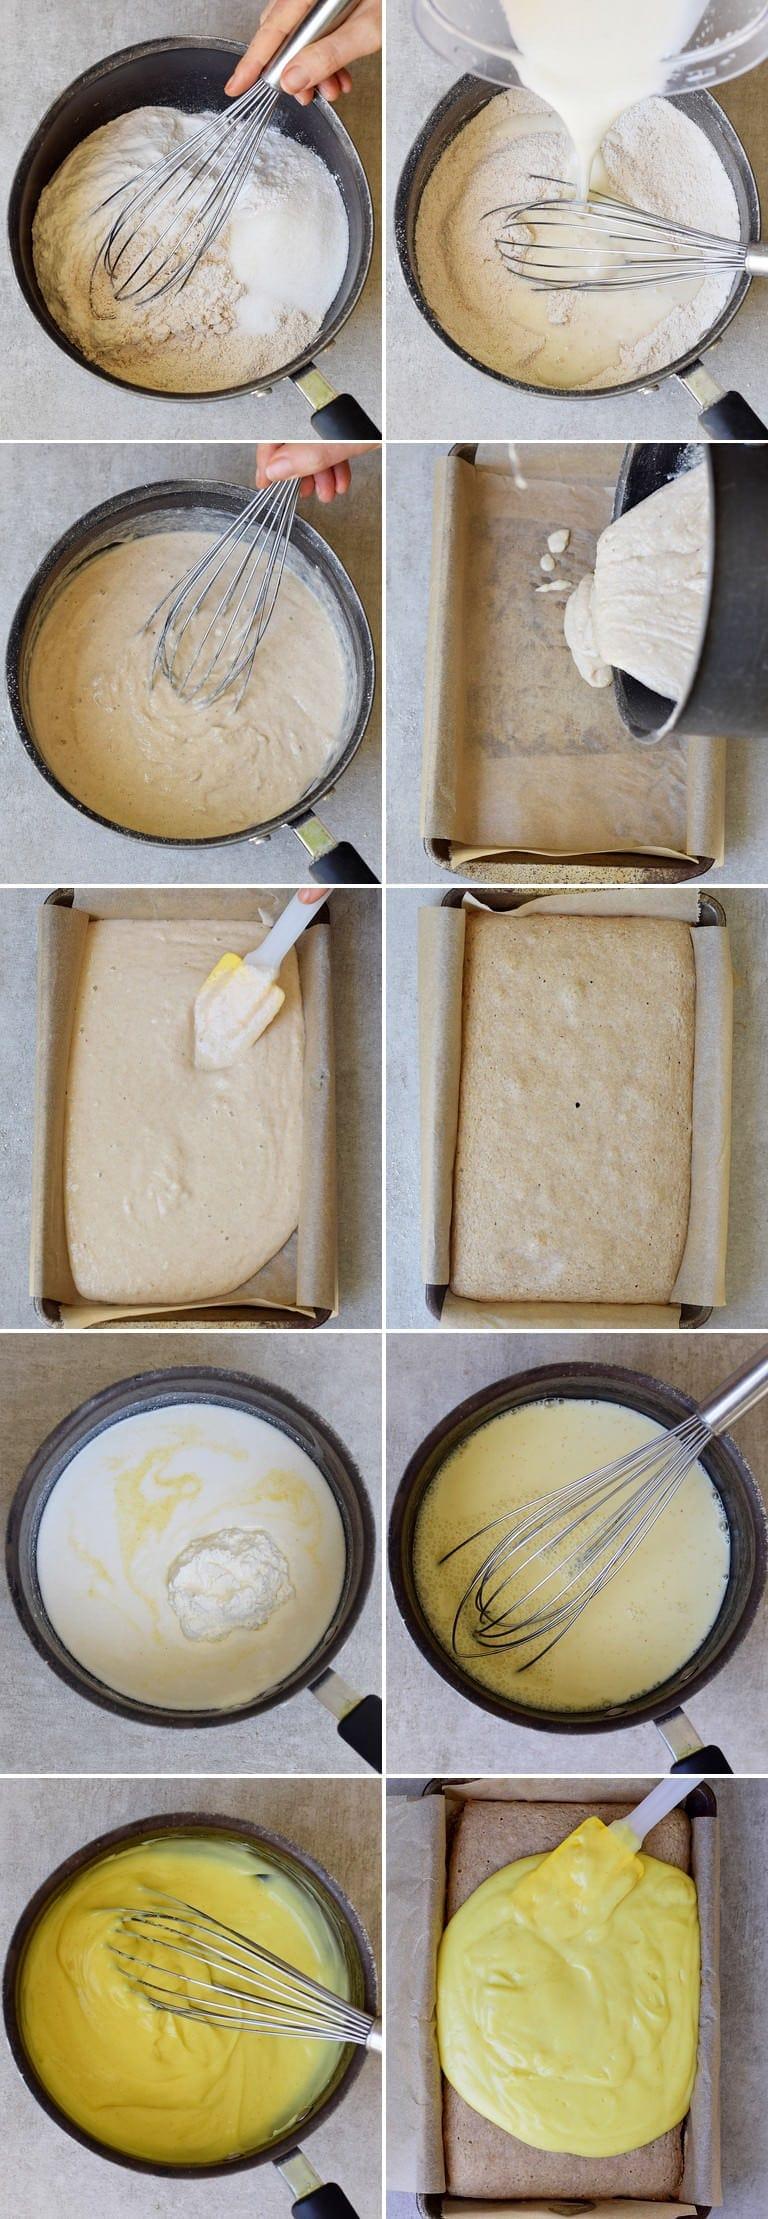 how to make a pudding cake